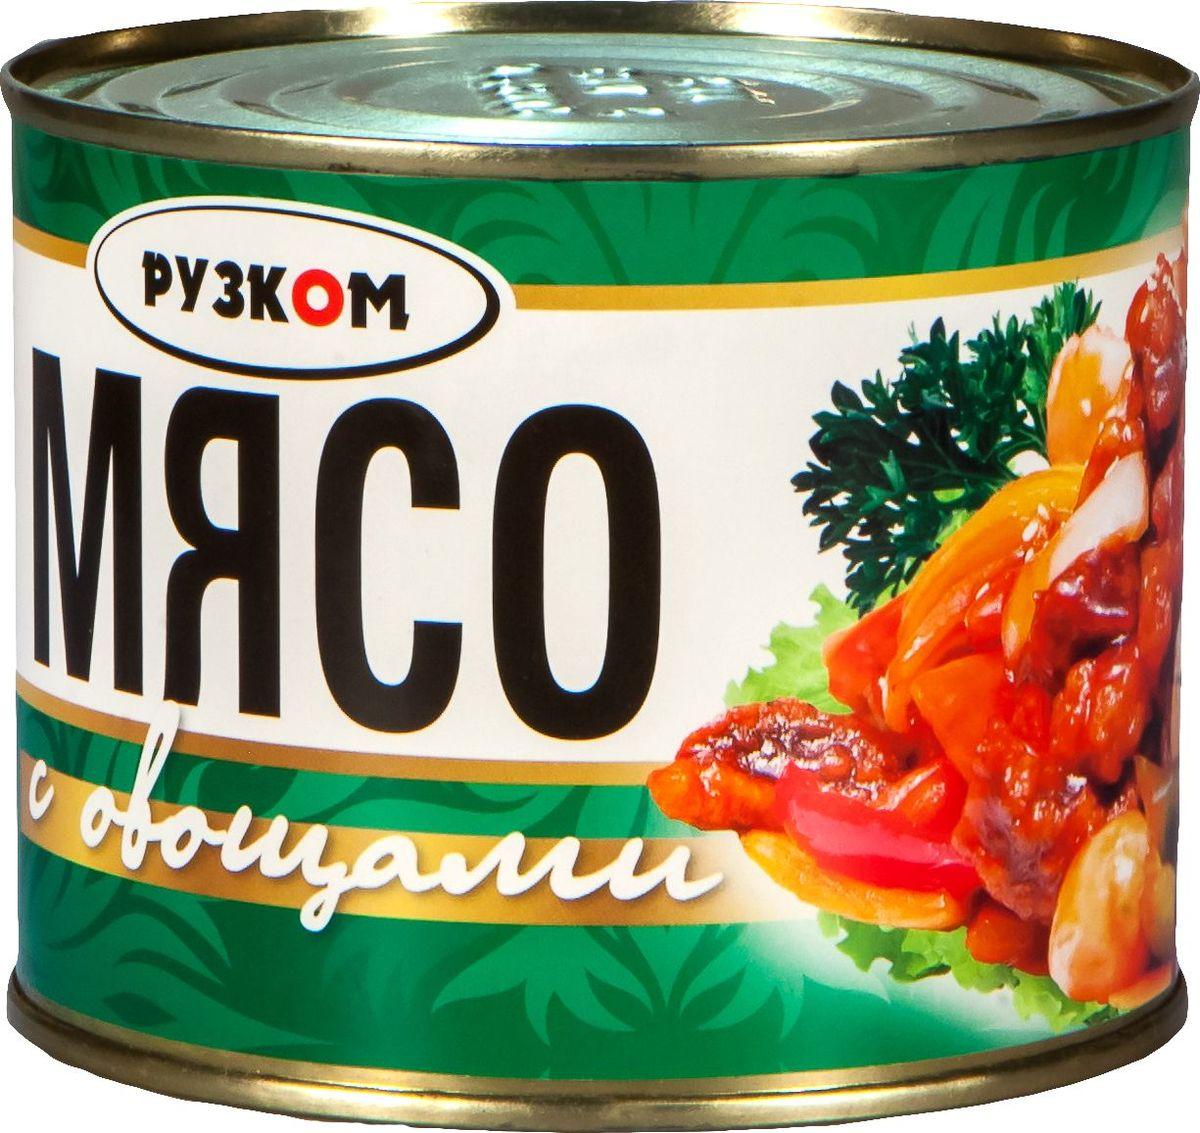 Рузком Мясо с овощами, 525 г холст 30x60 printio магелланово облако 2